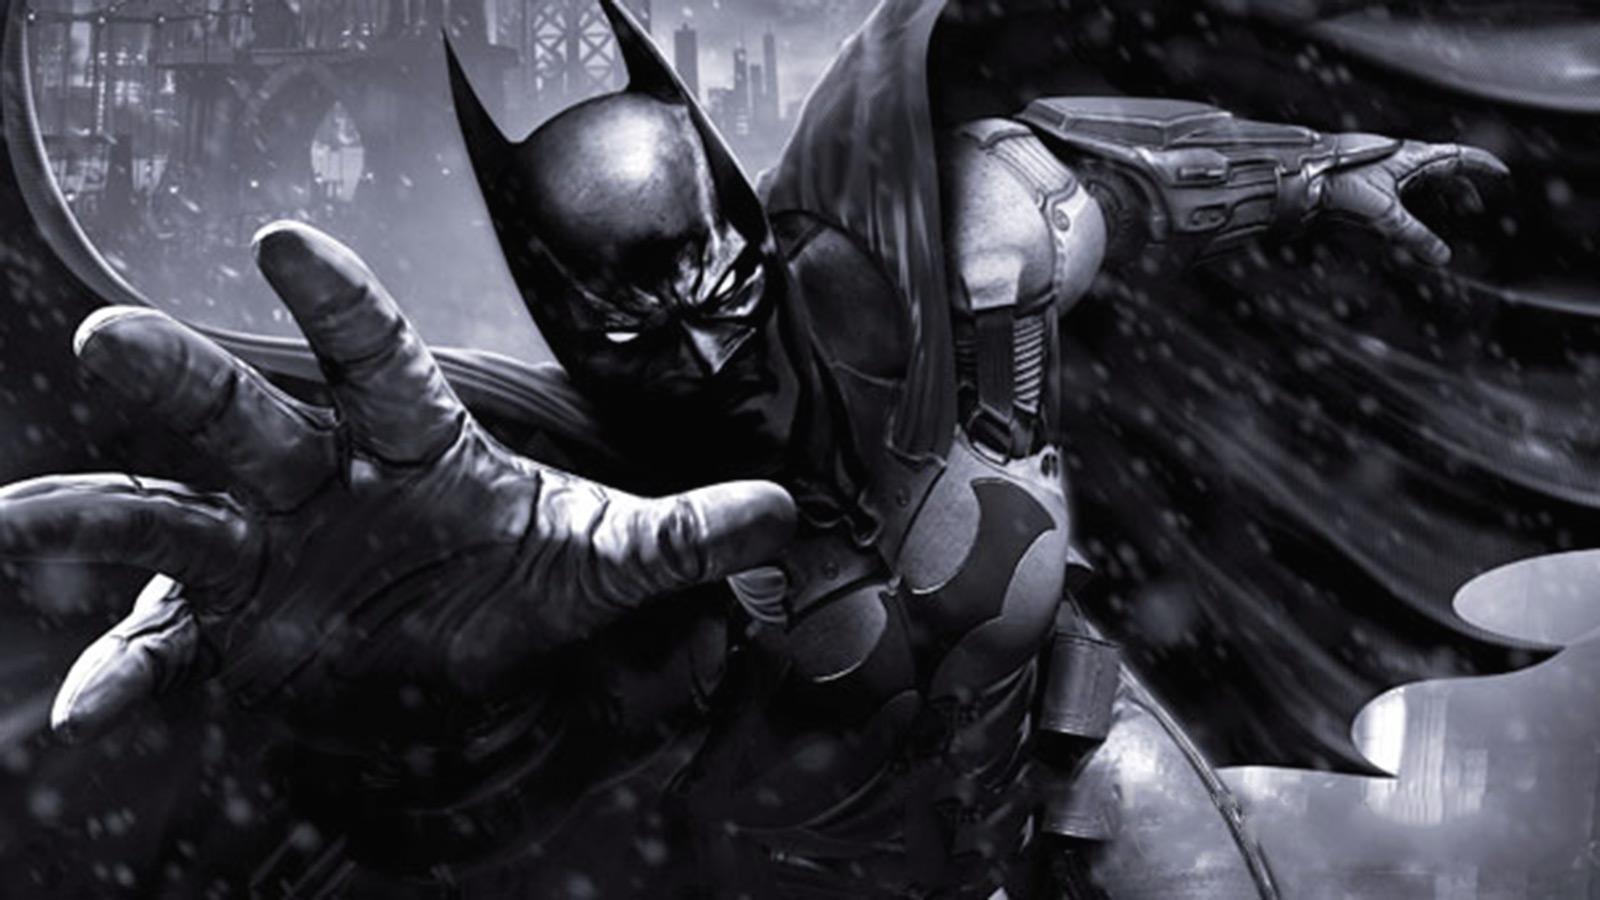 batman hd wallpapers free download 1600x900